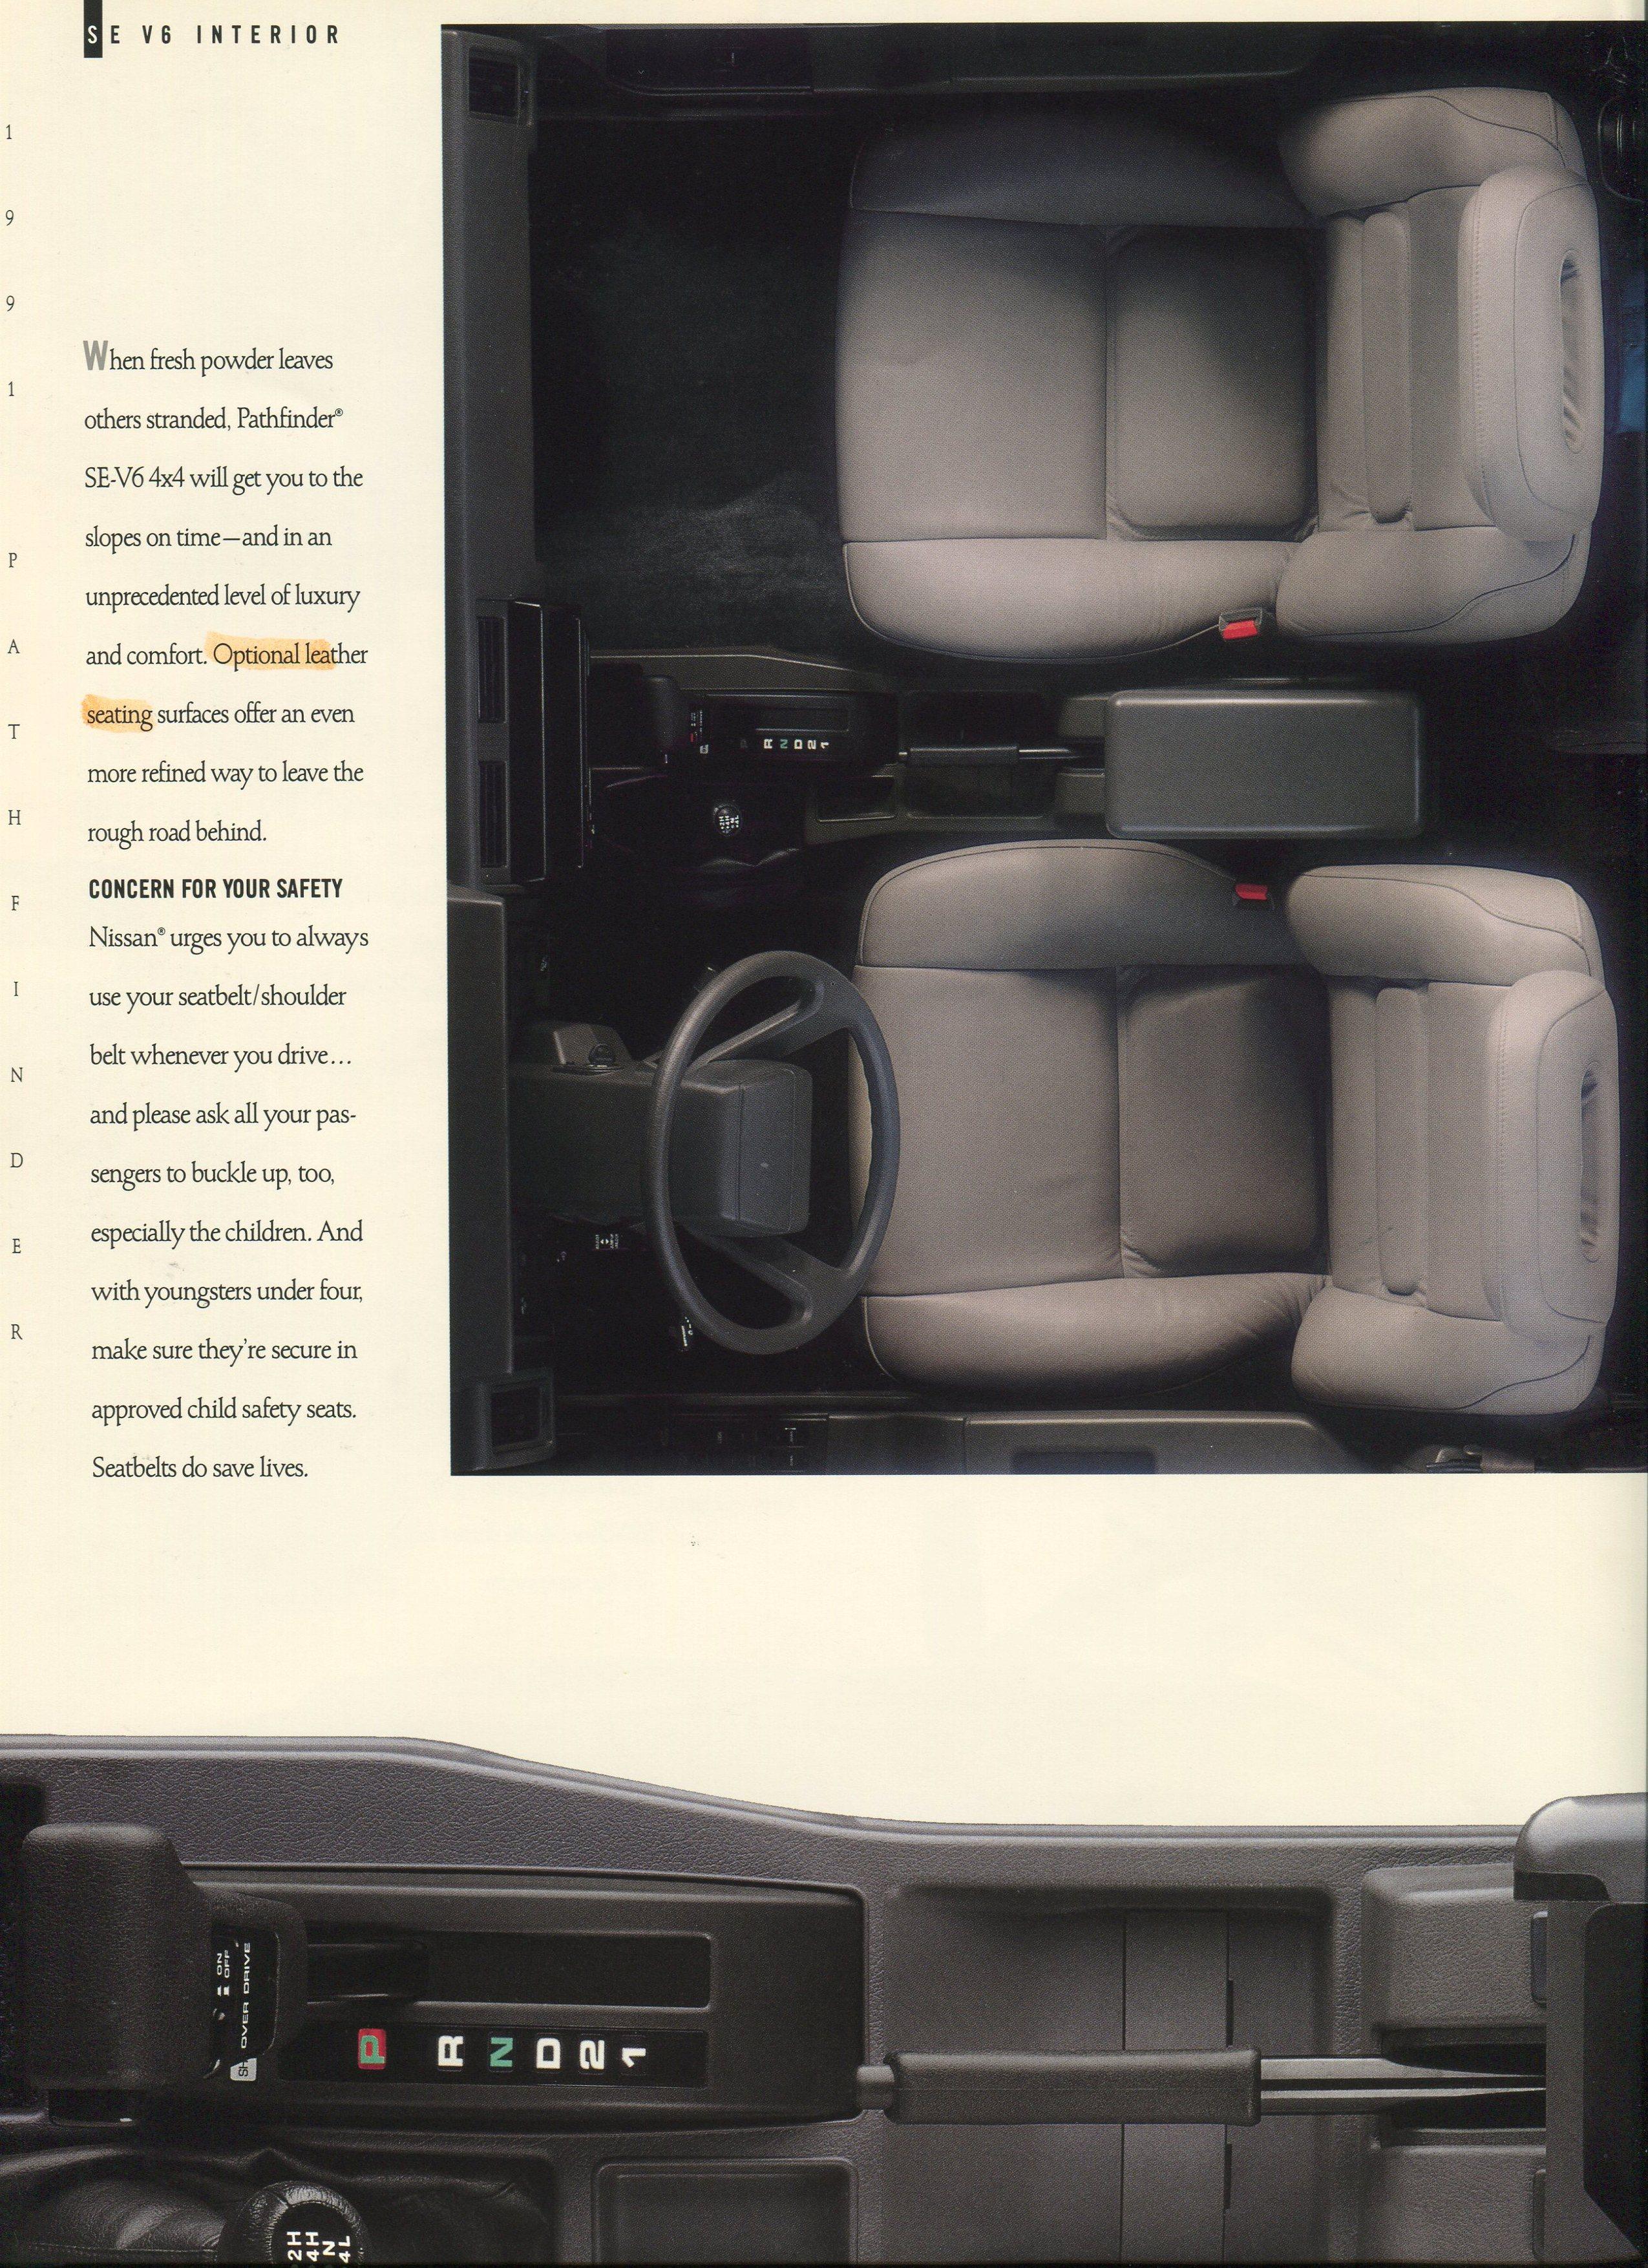 Nissan Pathfinder 2019 >> 1991 Nissan Pathfinder Dealer Brochure - NICOclub